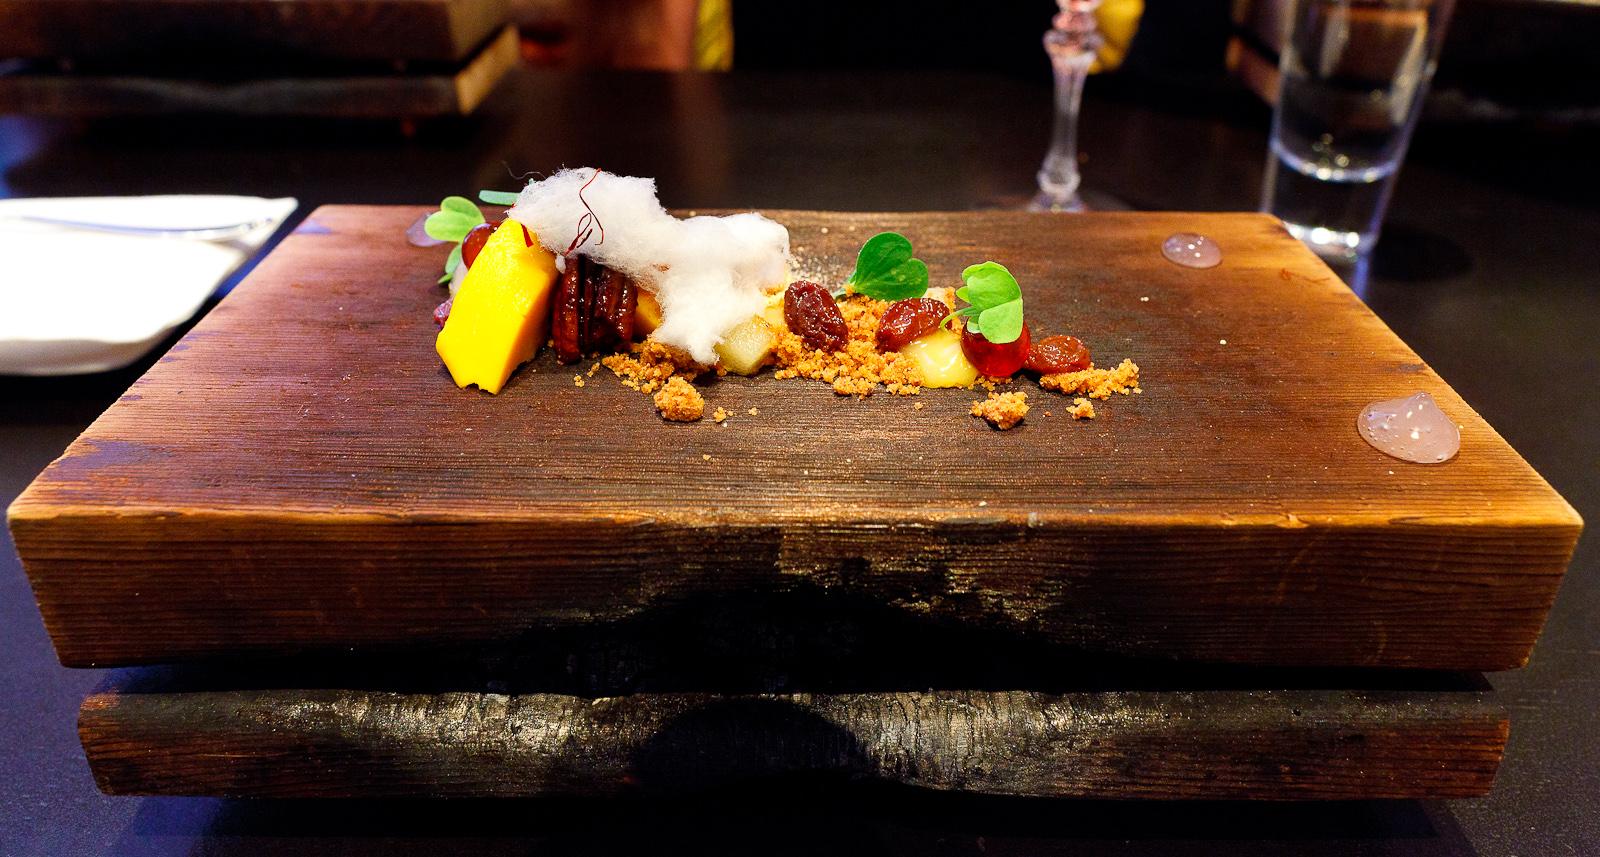 16th Course: Sweet potato, cedar, bourbon, pecan